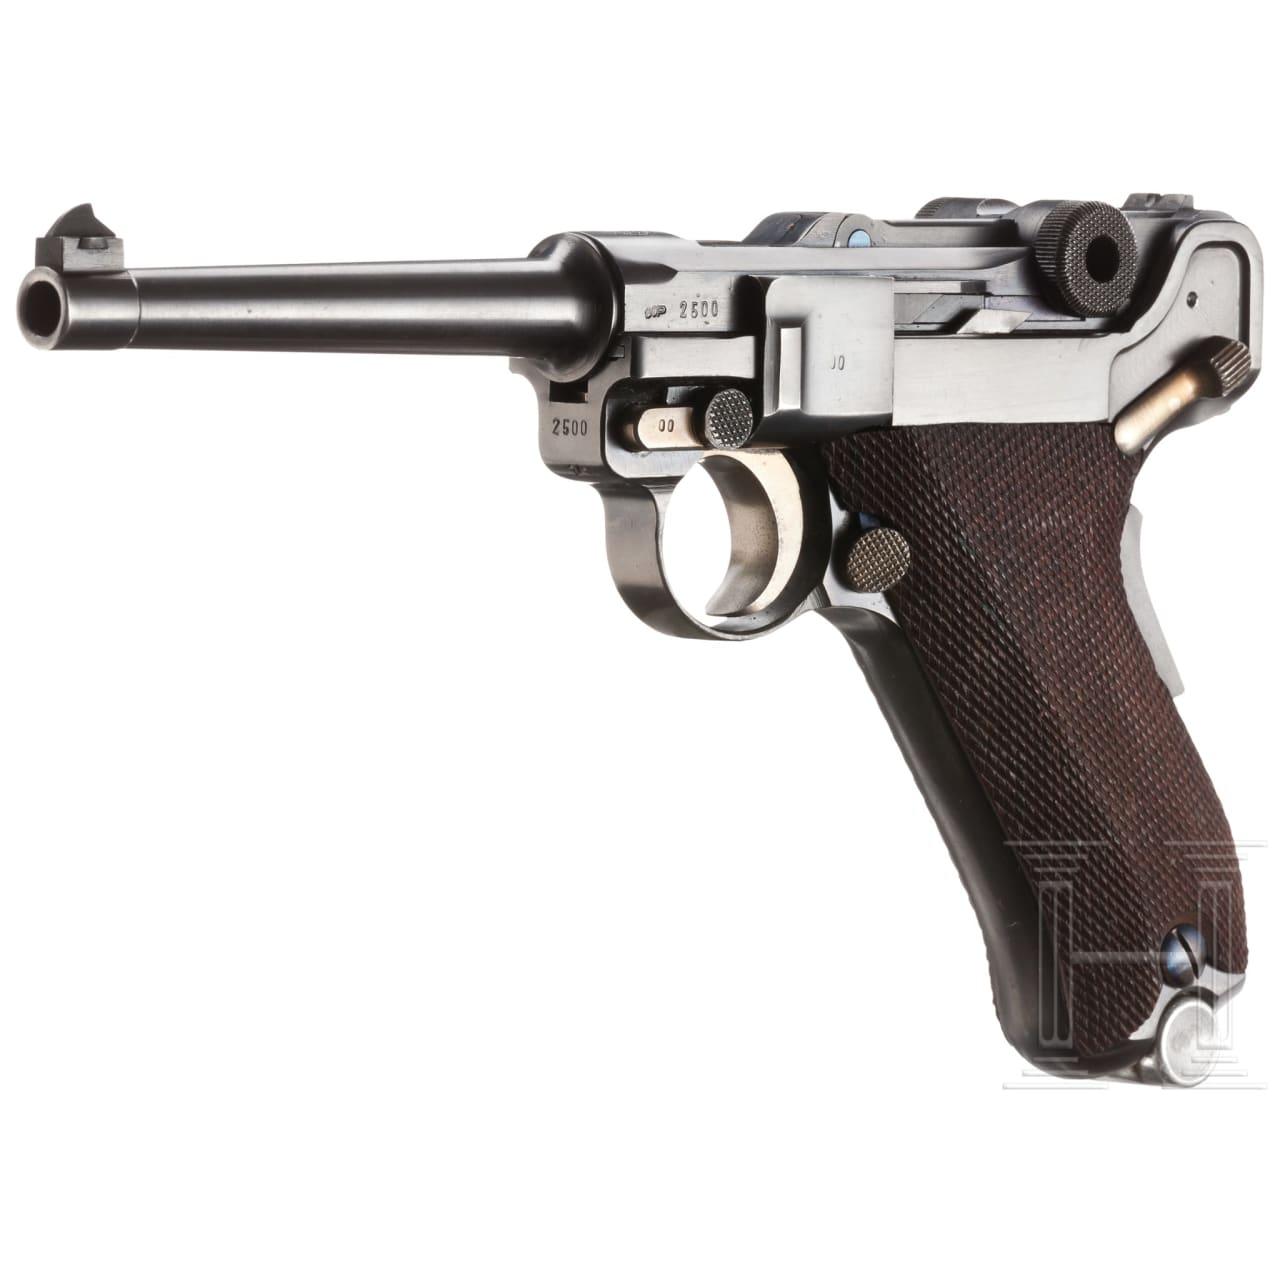 A Parabellum Mod. 06/34, Mauser, Portugal (m/935)